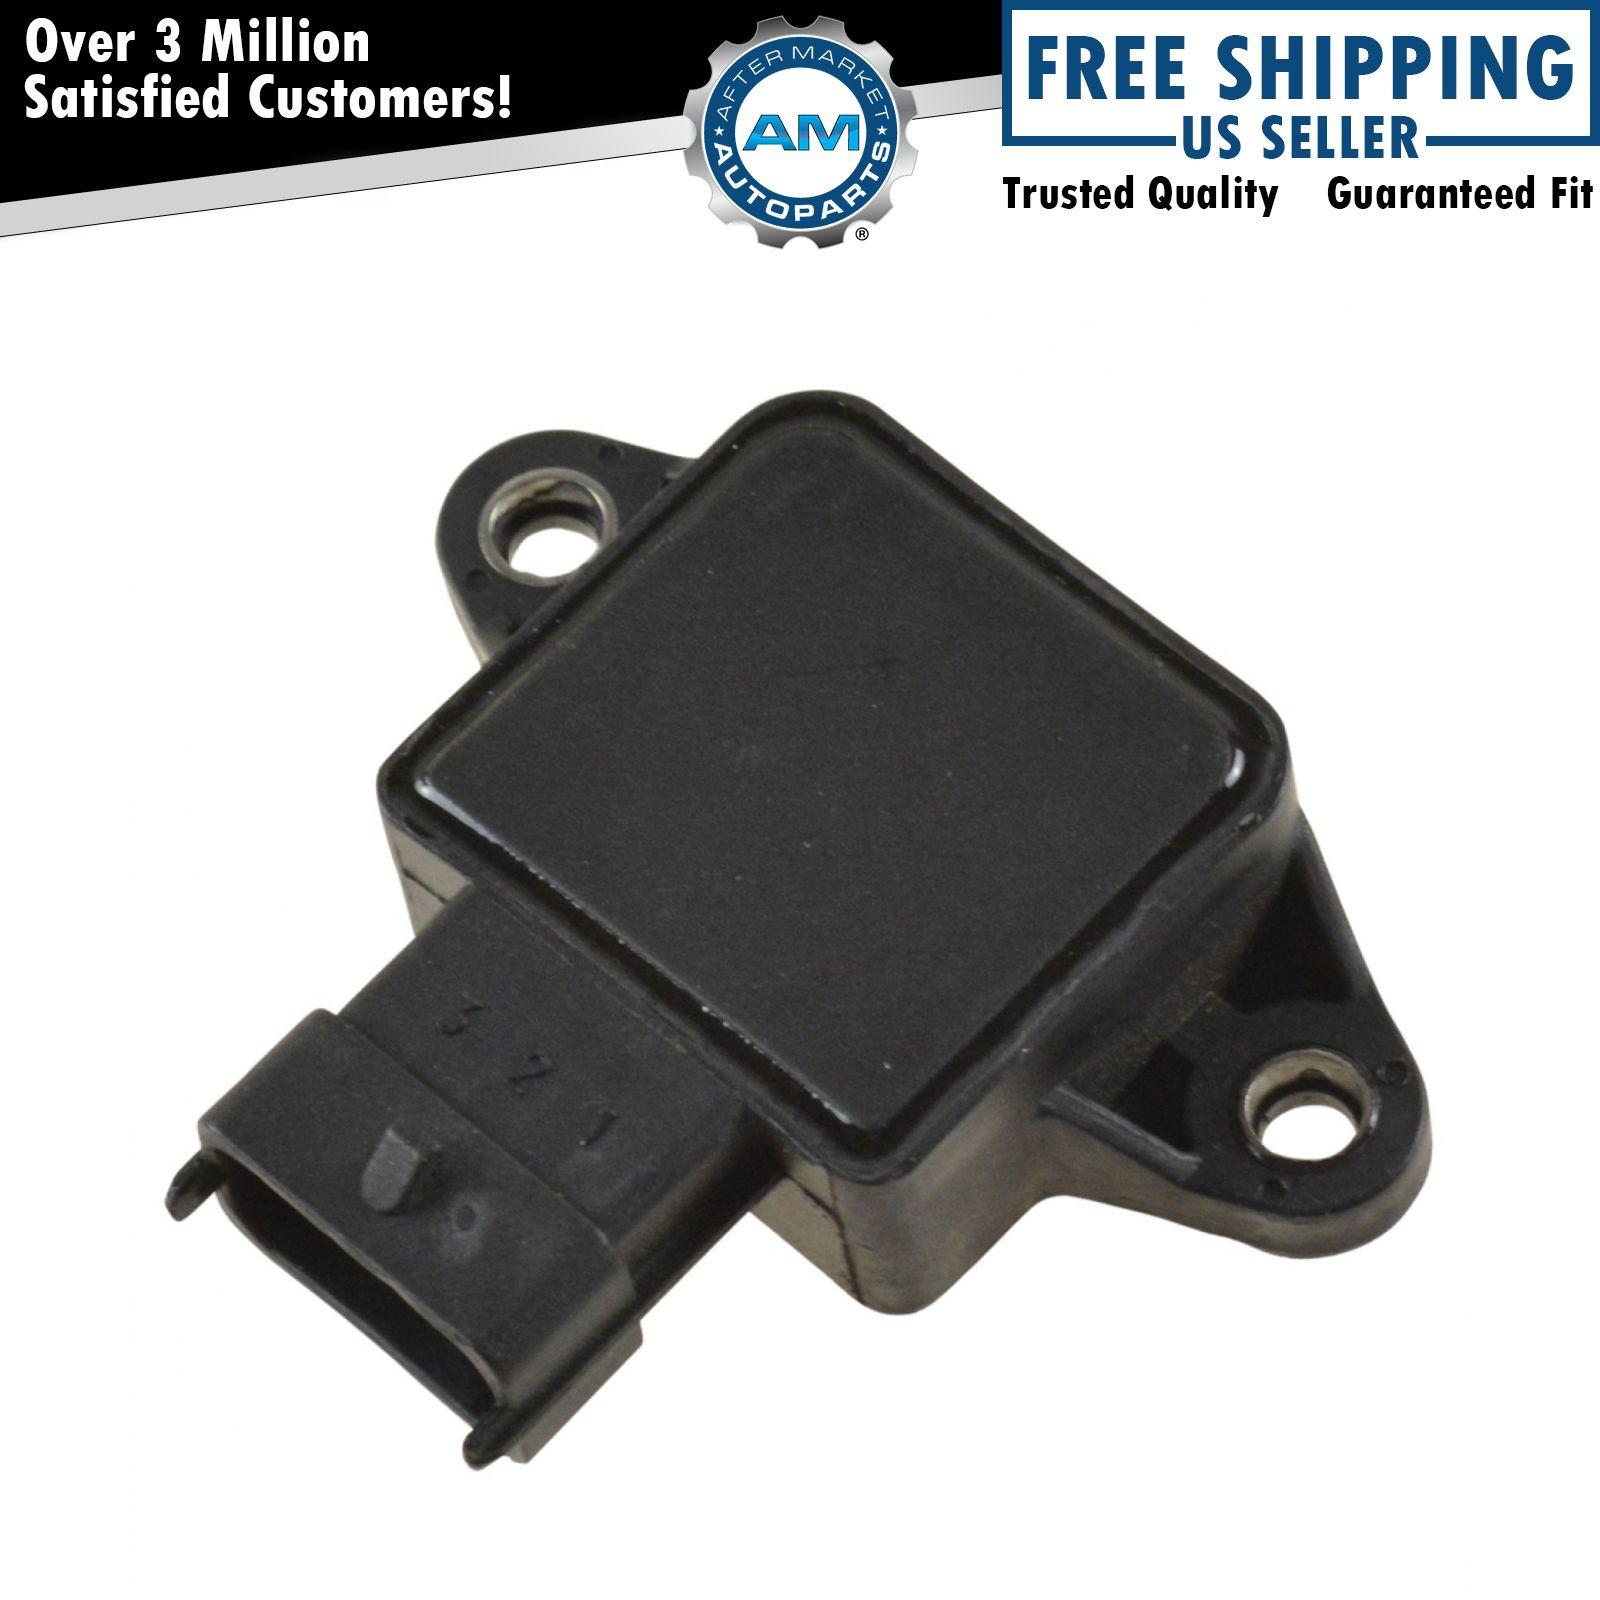 Throttle Position Sensor Hyundai Accent: Throttle Position Sensor TPS For Accent Elantra Tiburon